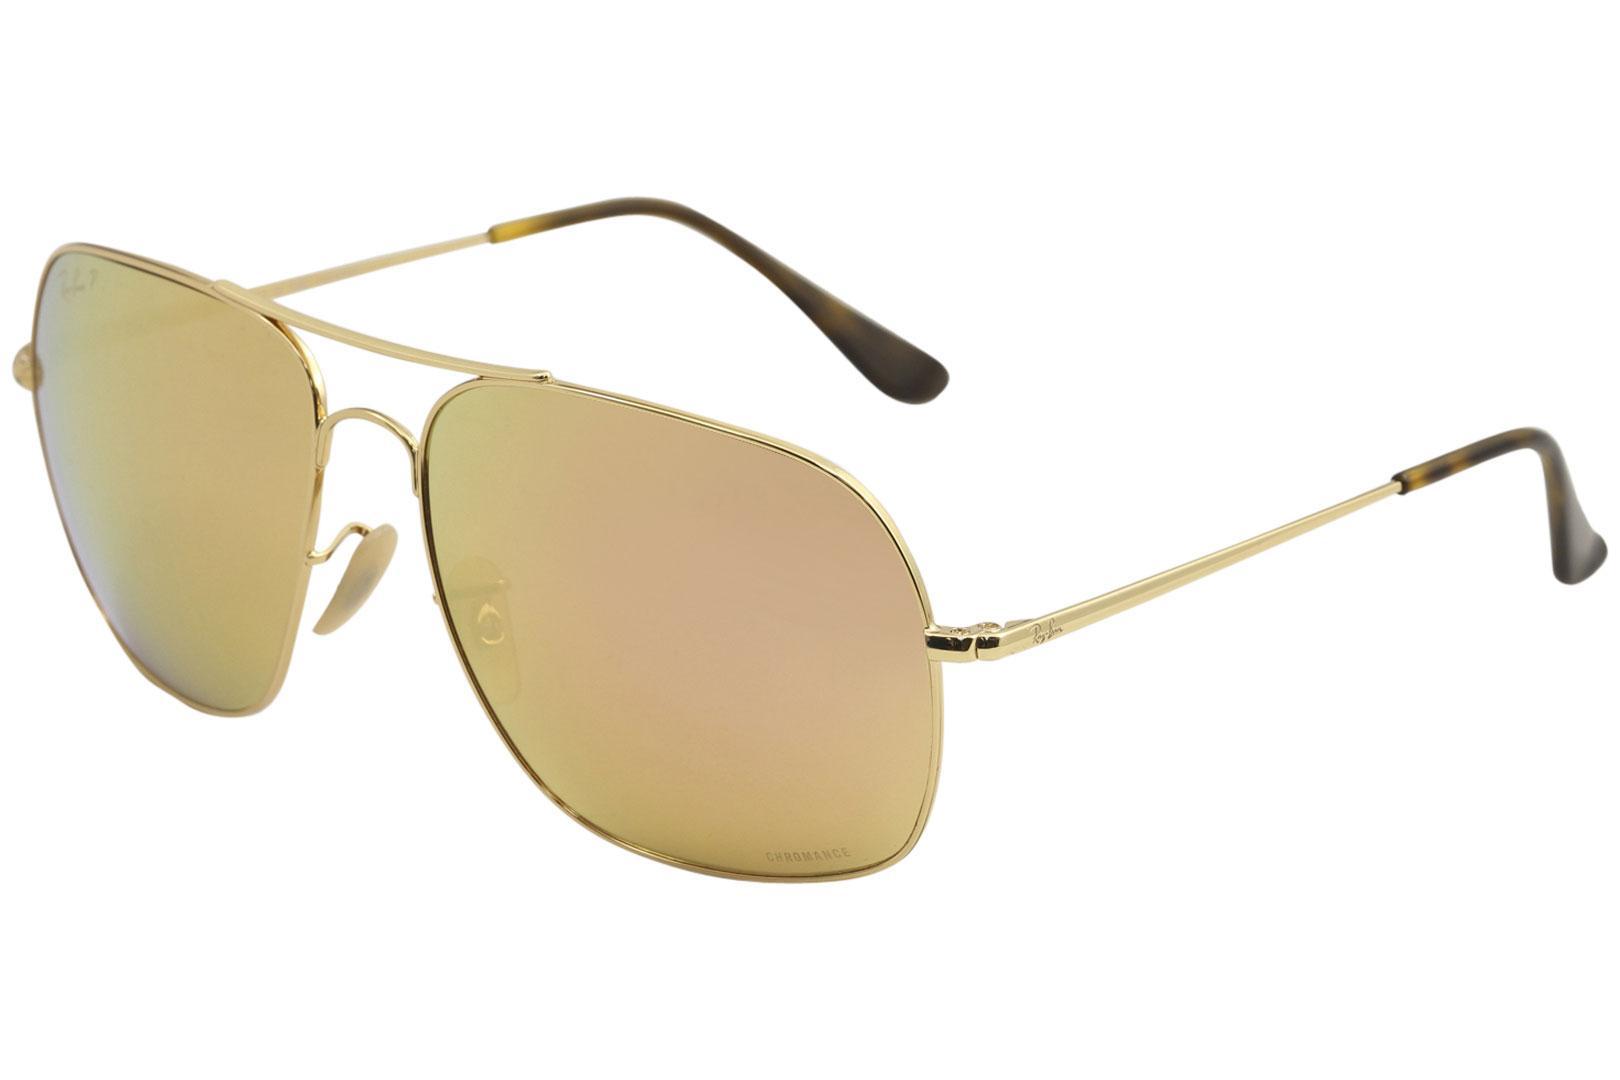 e6e2151e23e Ray Ban Men s RB3587CH RB 3587 CH Fashion Pilot RayBan Sunglasses